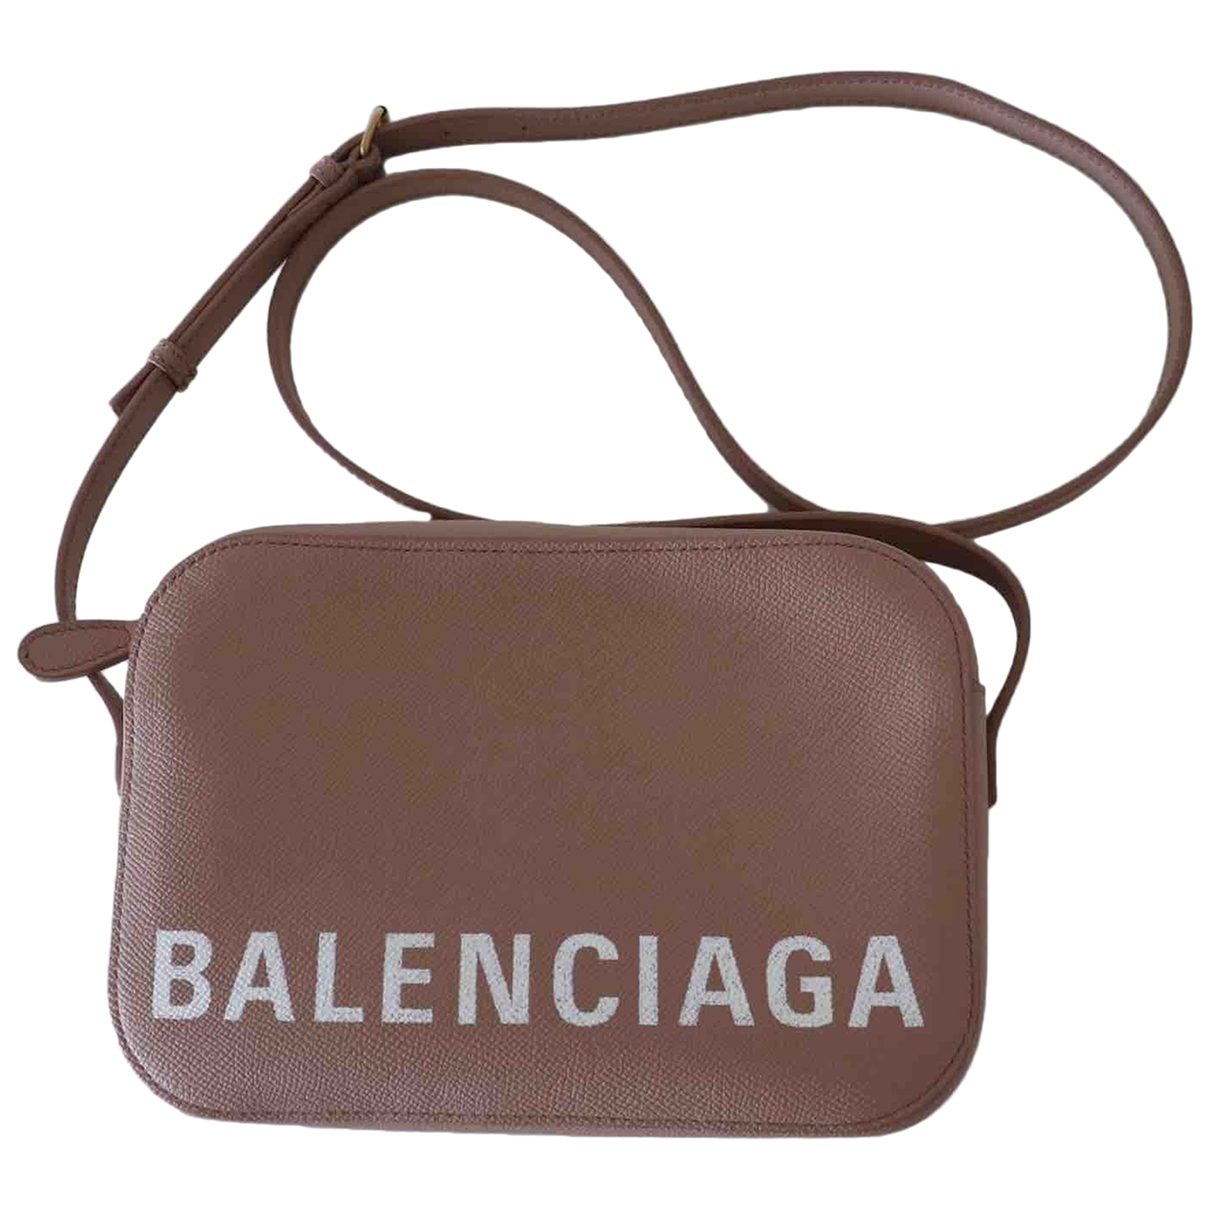 Balenciaga - Sac a main Everyday pour femme en cuir - rose